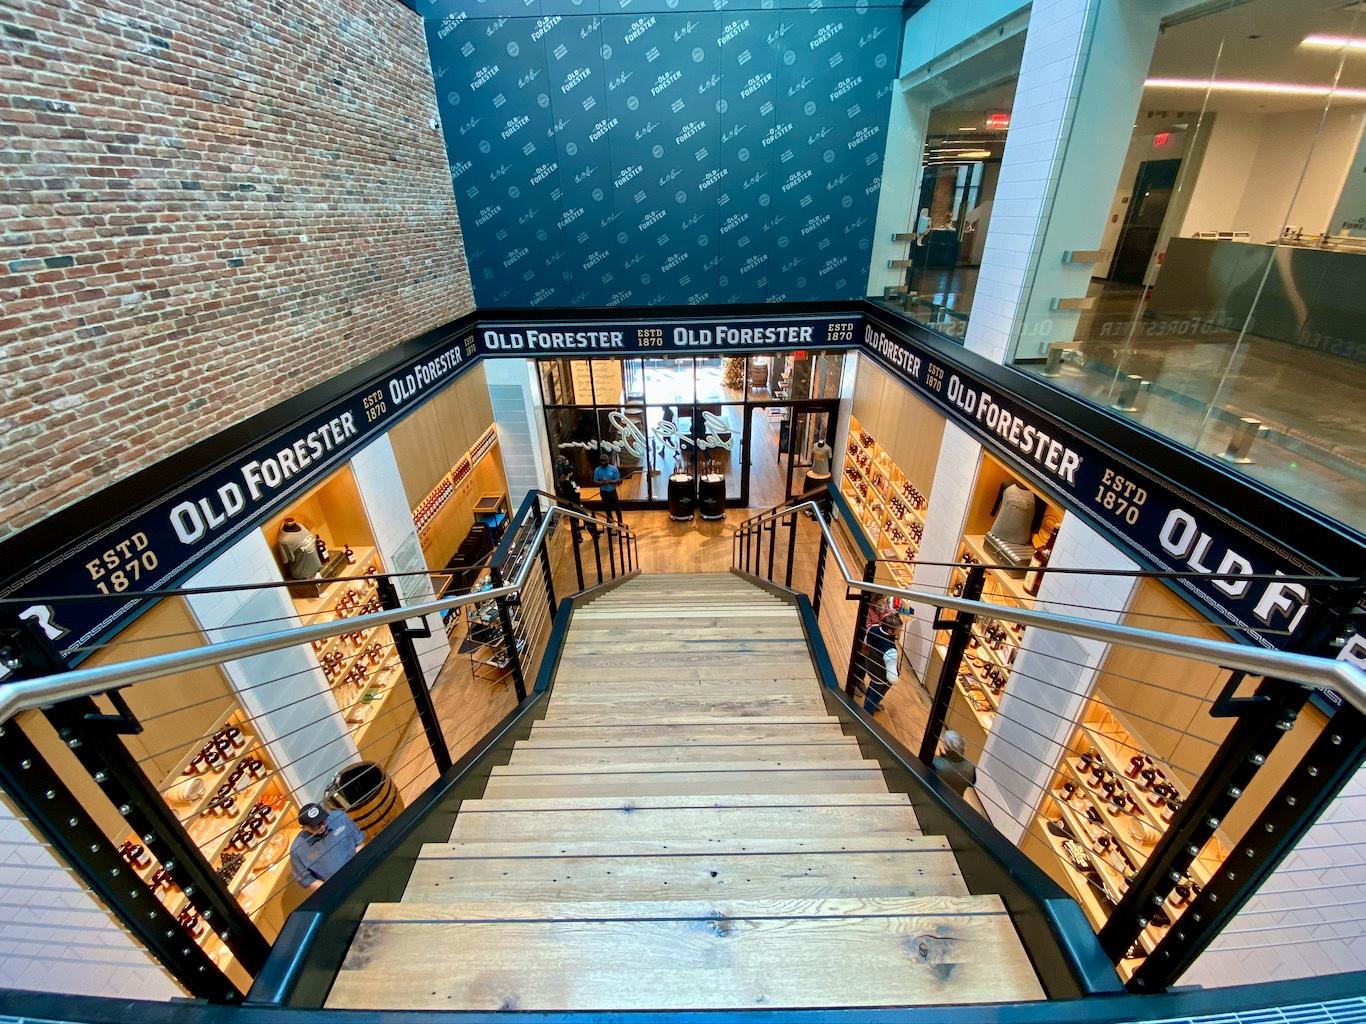 Gift Shop - Old Forester Distillery